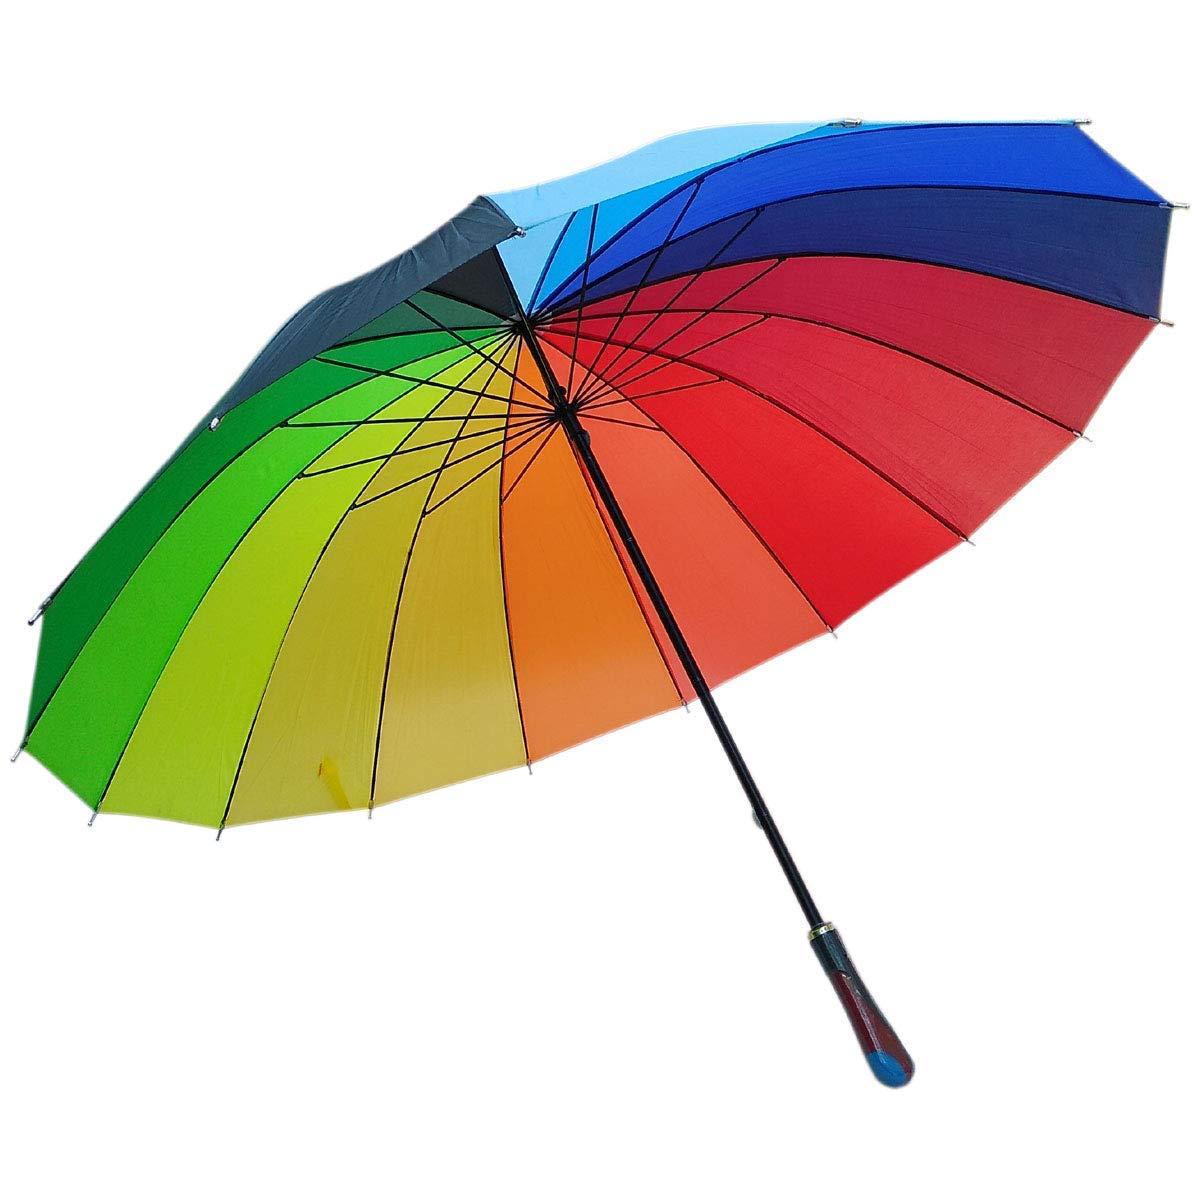 Rainbow umbrella.